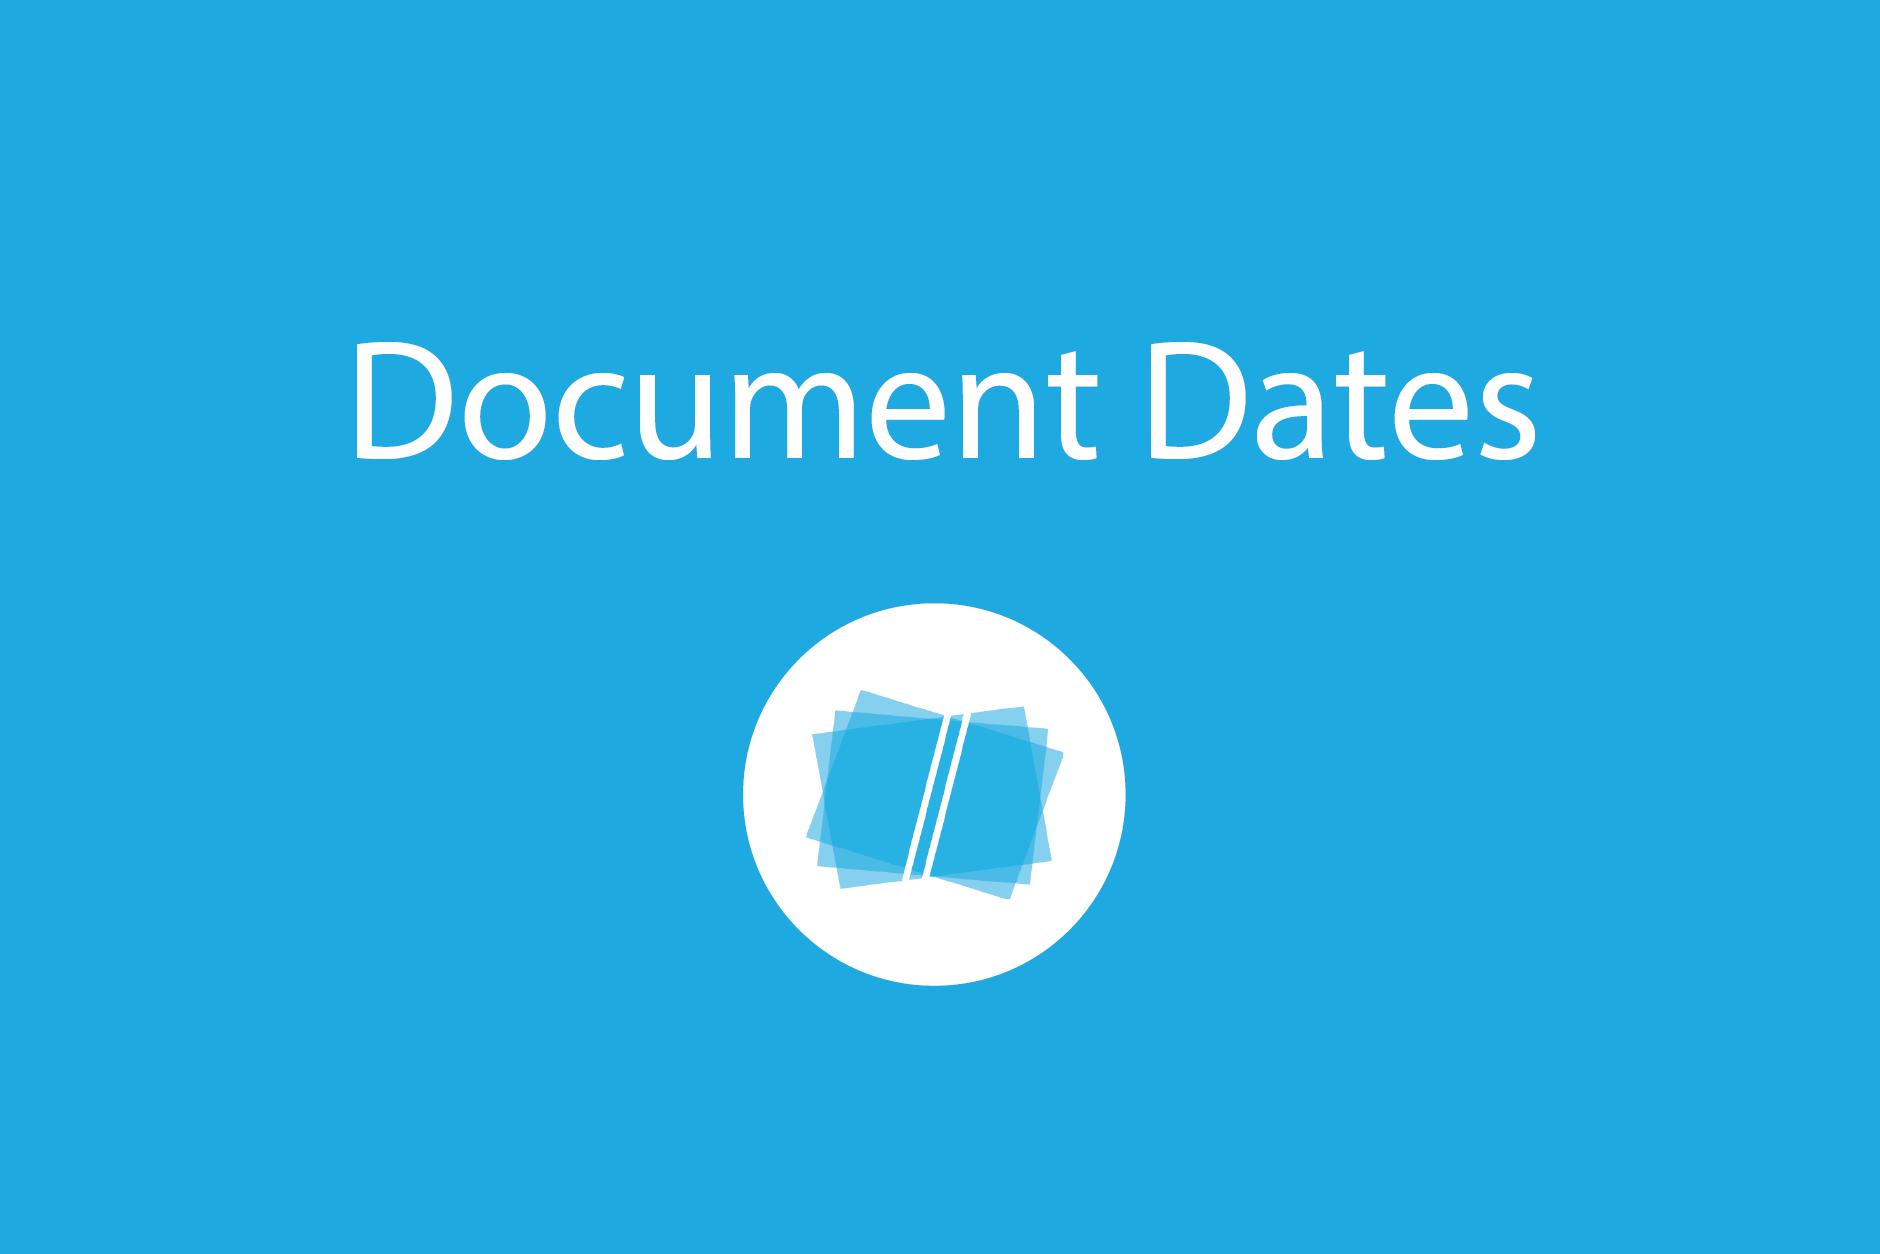 Document_Dates_Bundledocs.png